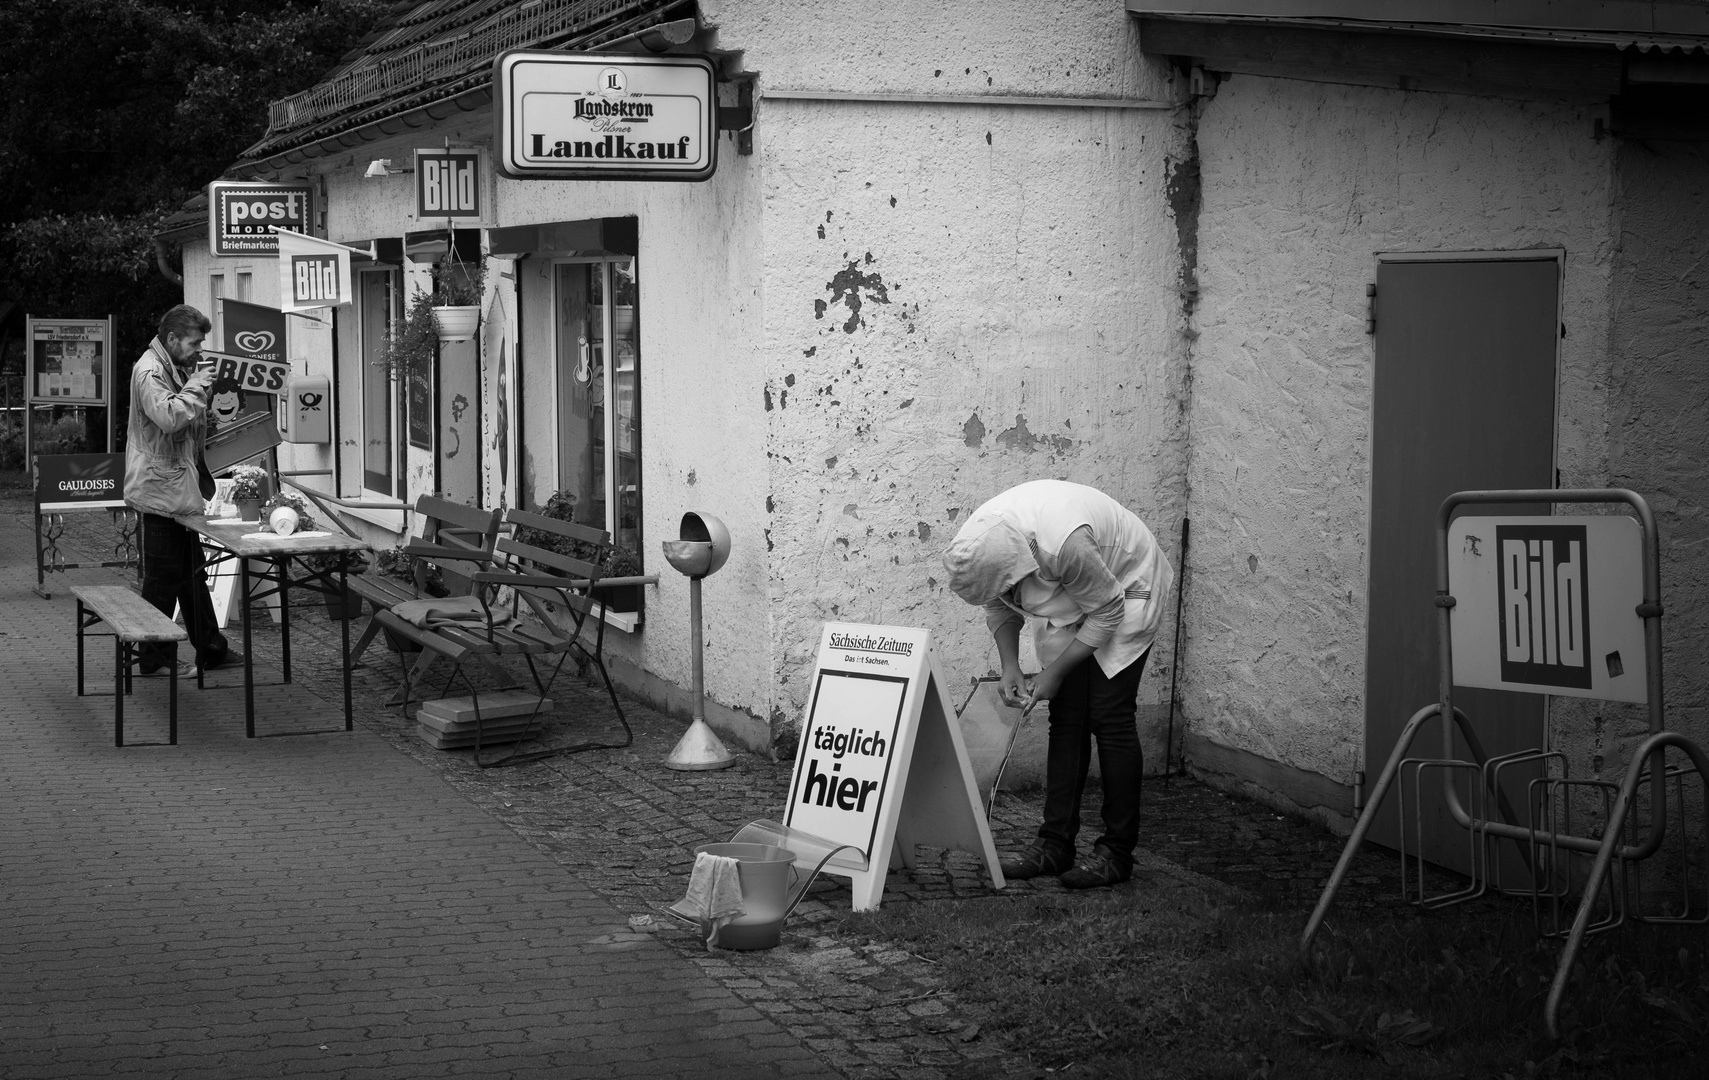 Imbiß Friedersdorf O.L., Sachsen